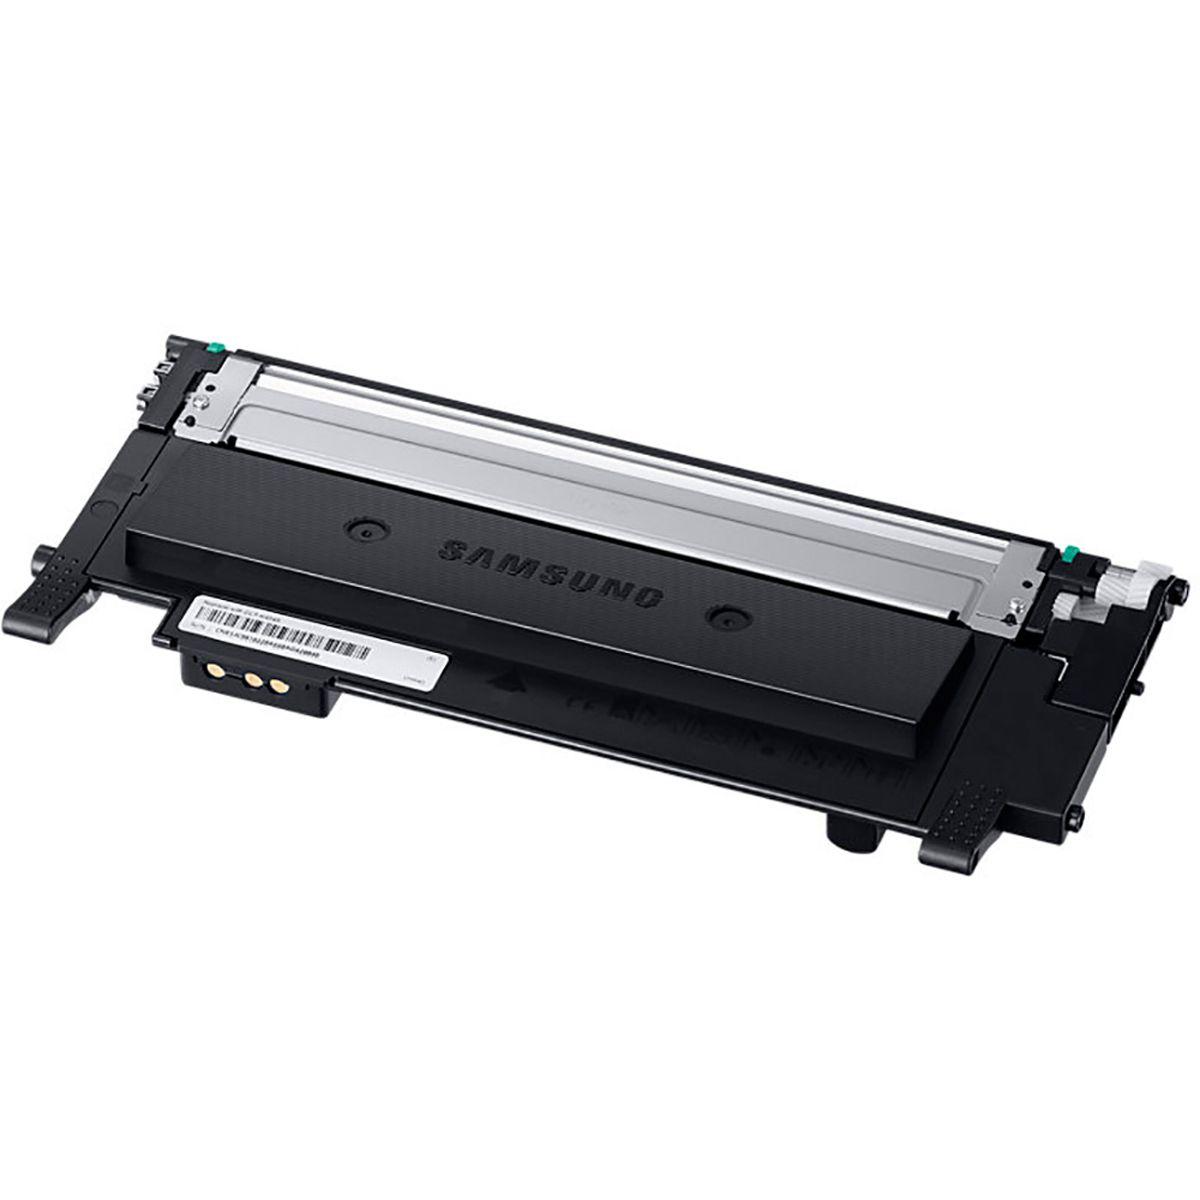 Toner Samsung CLT-K404S Preto - C430 C480 C430W C480W C480FW Compativel